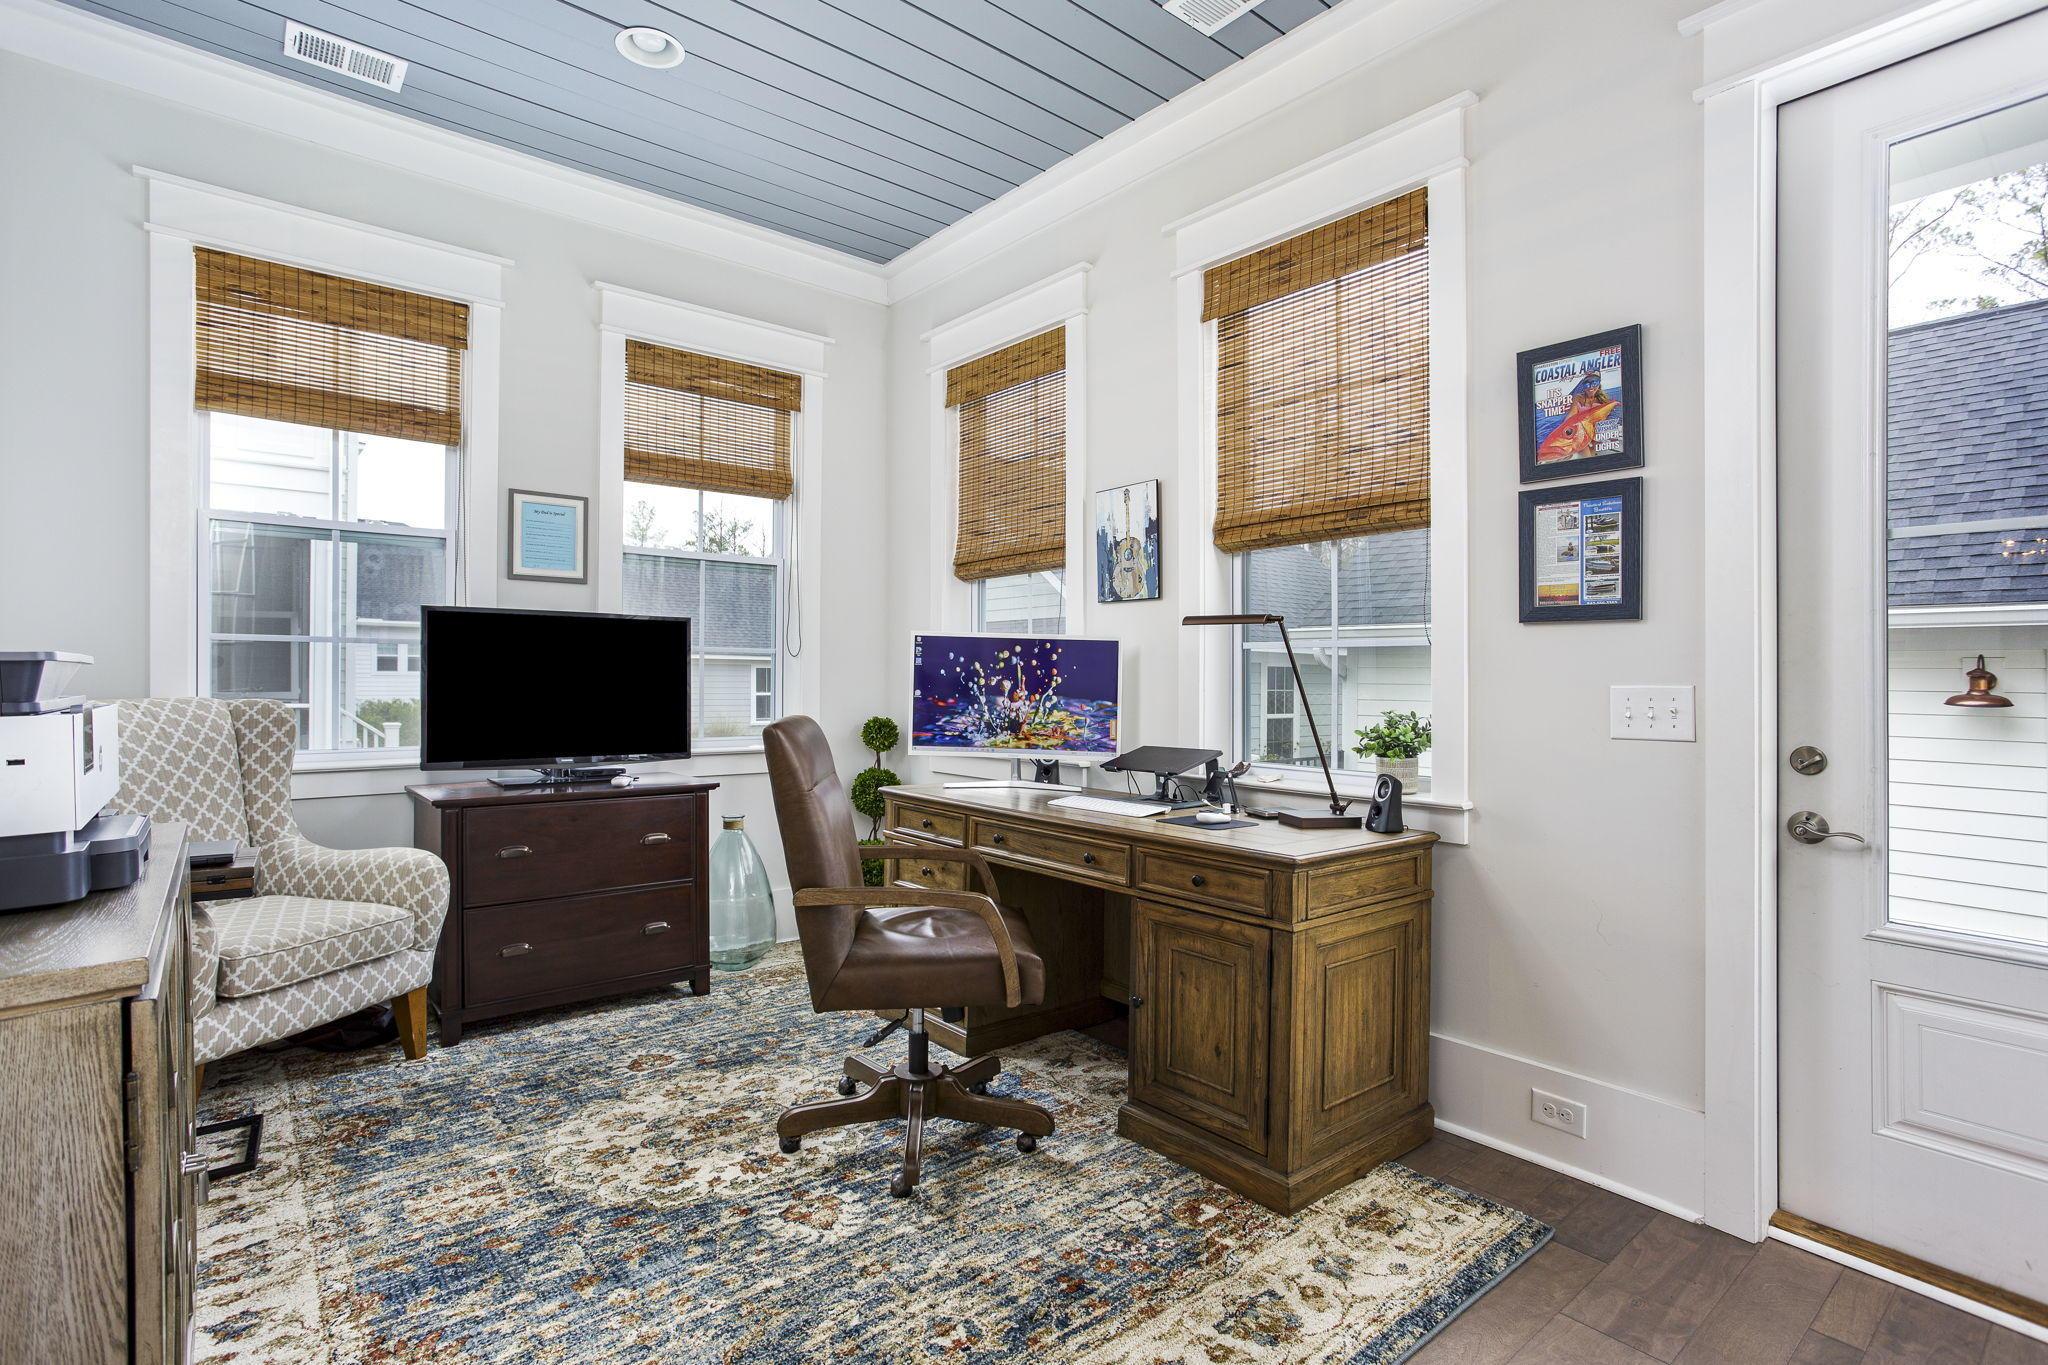 Carolina Park Homes For Sale - 3590 Backshore, Mount Pleasant, SC - 68